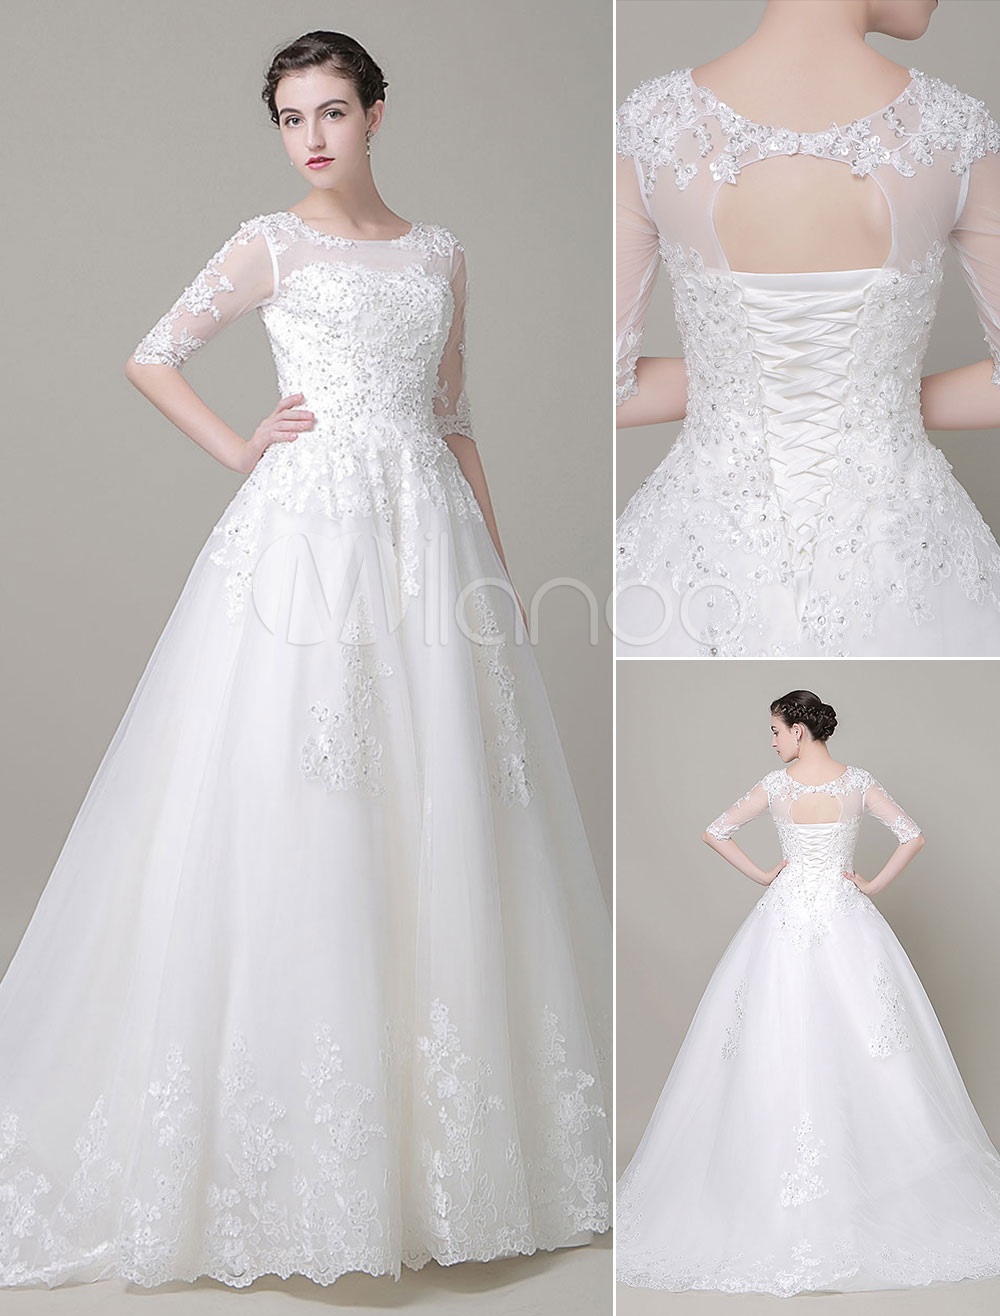 A-Line Wedding Dress Illusion Jewel Neckline Lace Beading Court Train Bridal Dress